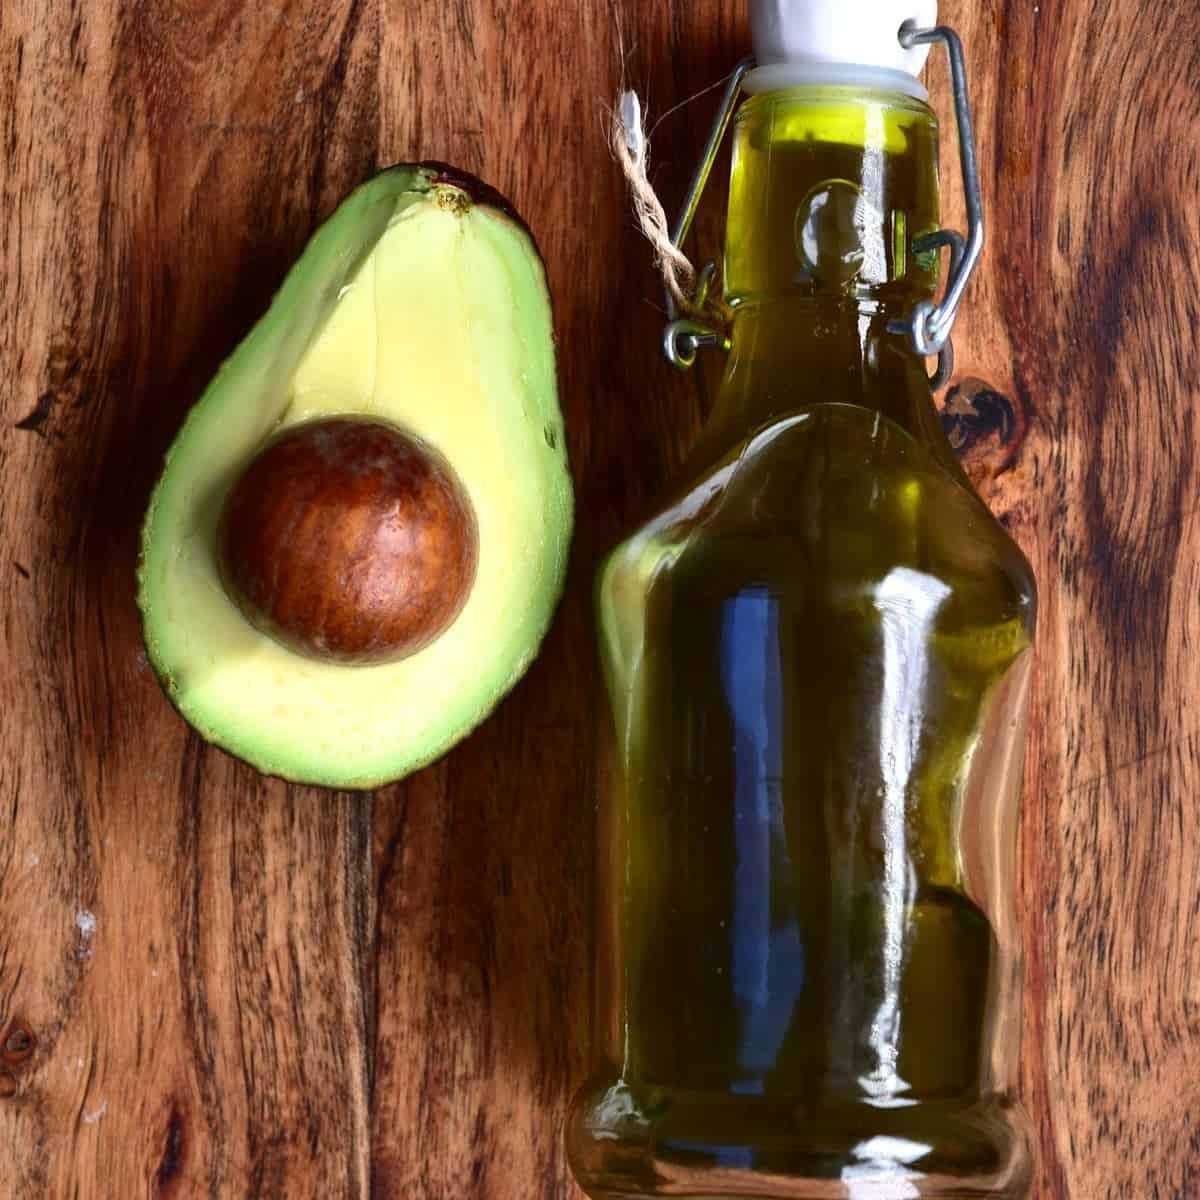 Half an avocado and a small bottle with homemade avocado oil